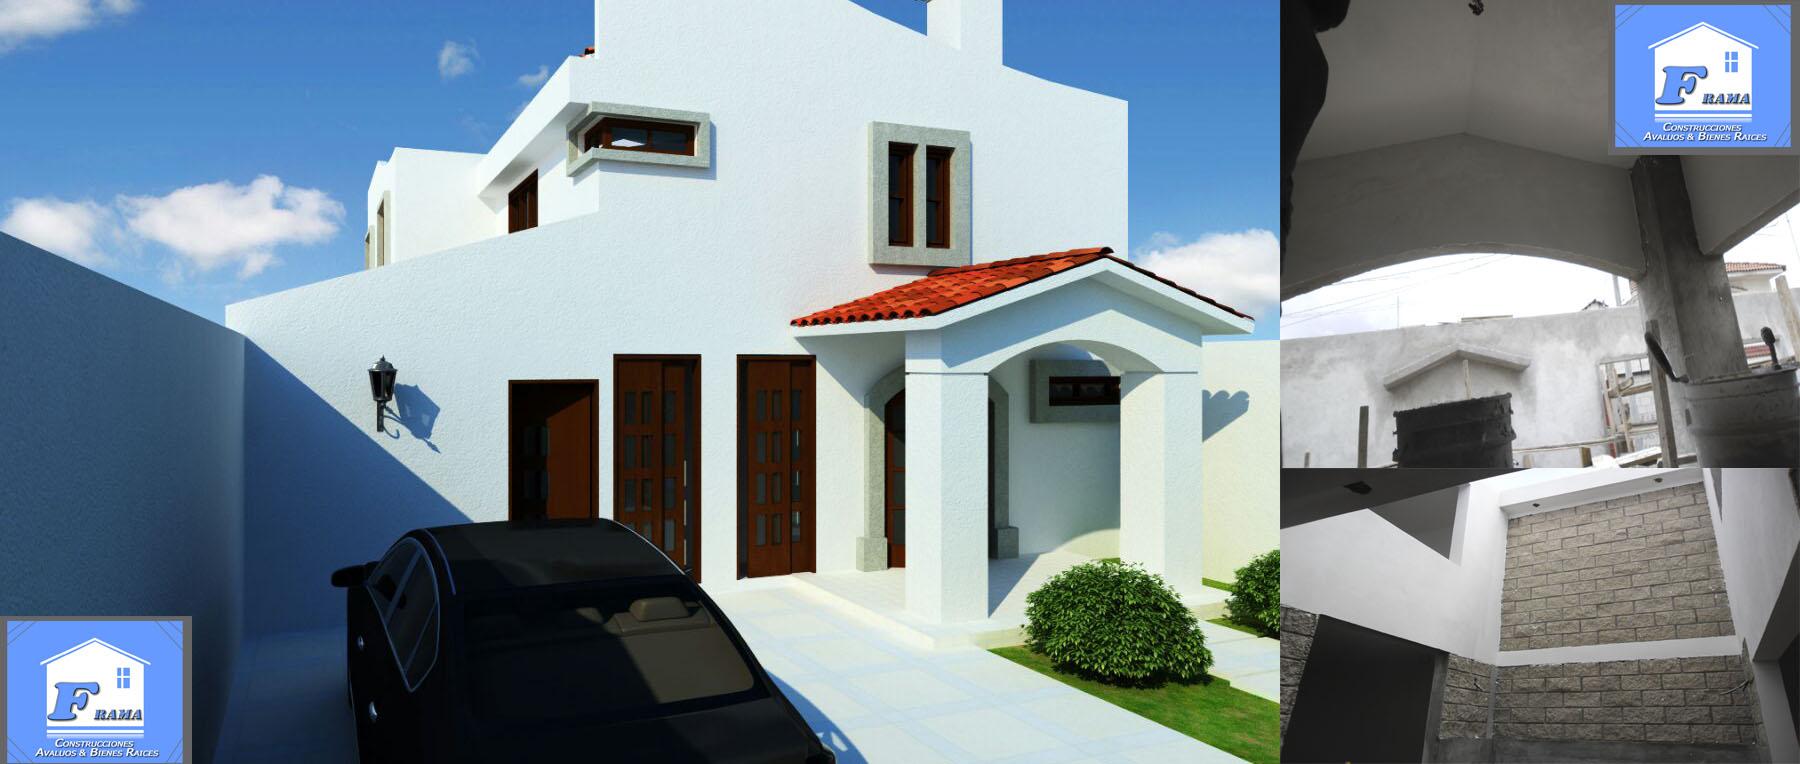 Venta de casa en zona 7 de quetzaltenango frama inmobiliaria for Casas inmobiliaria